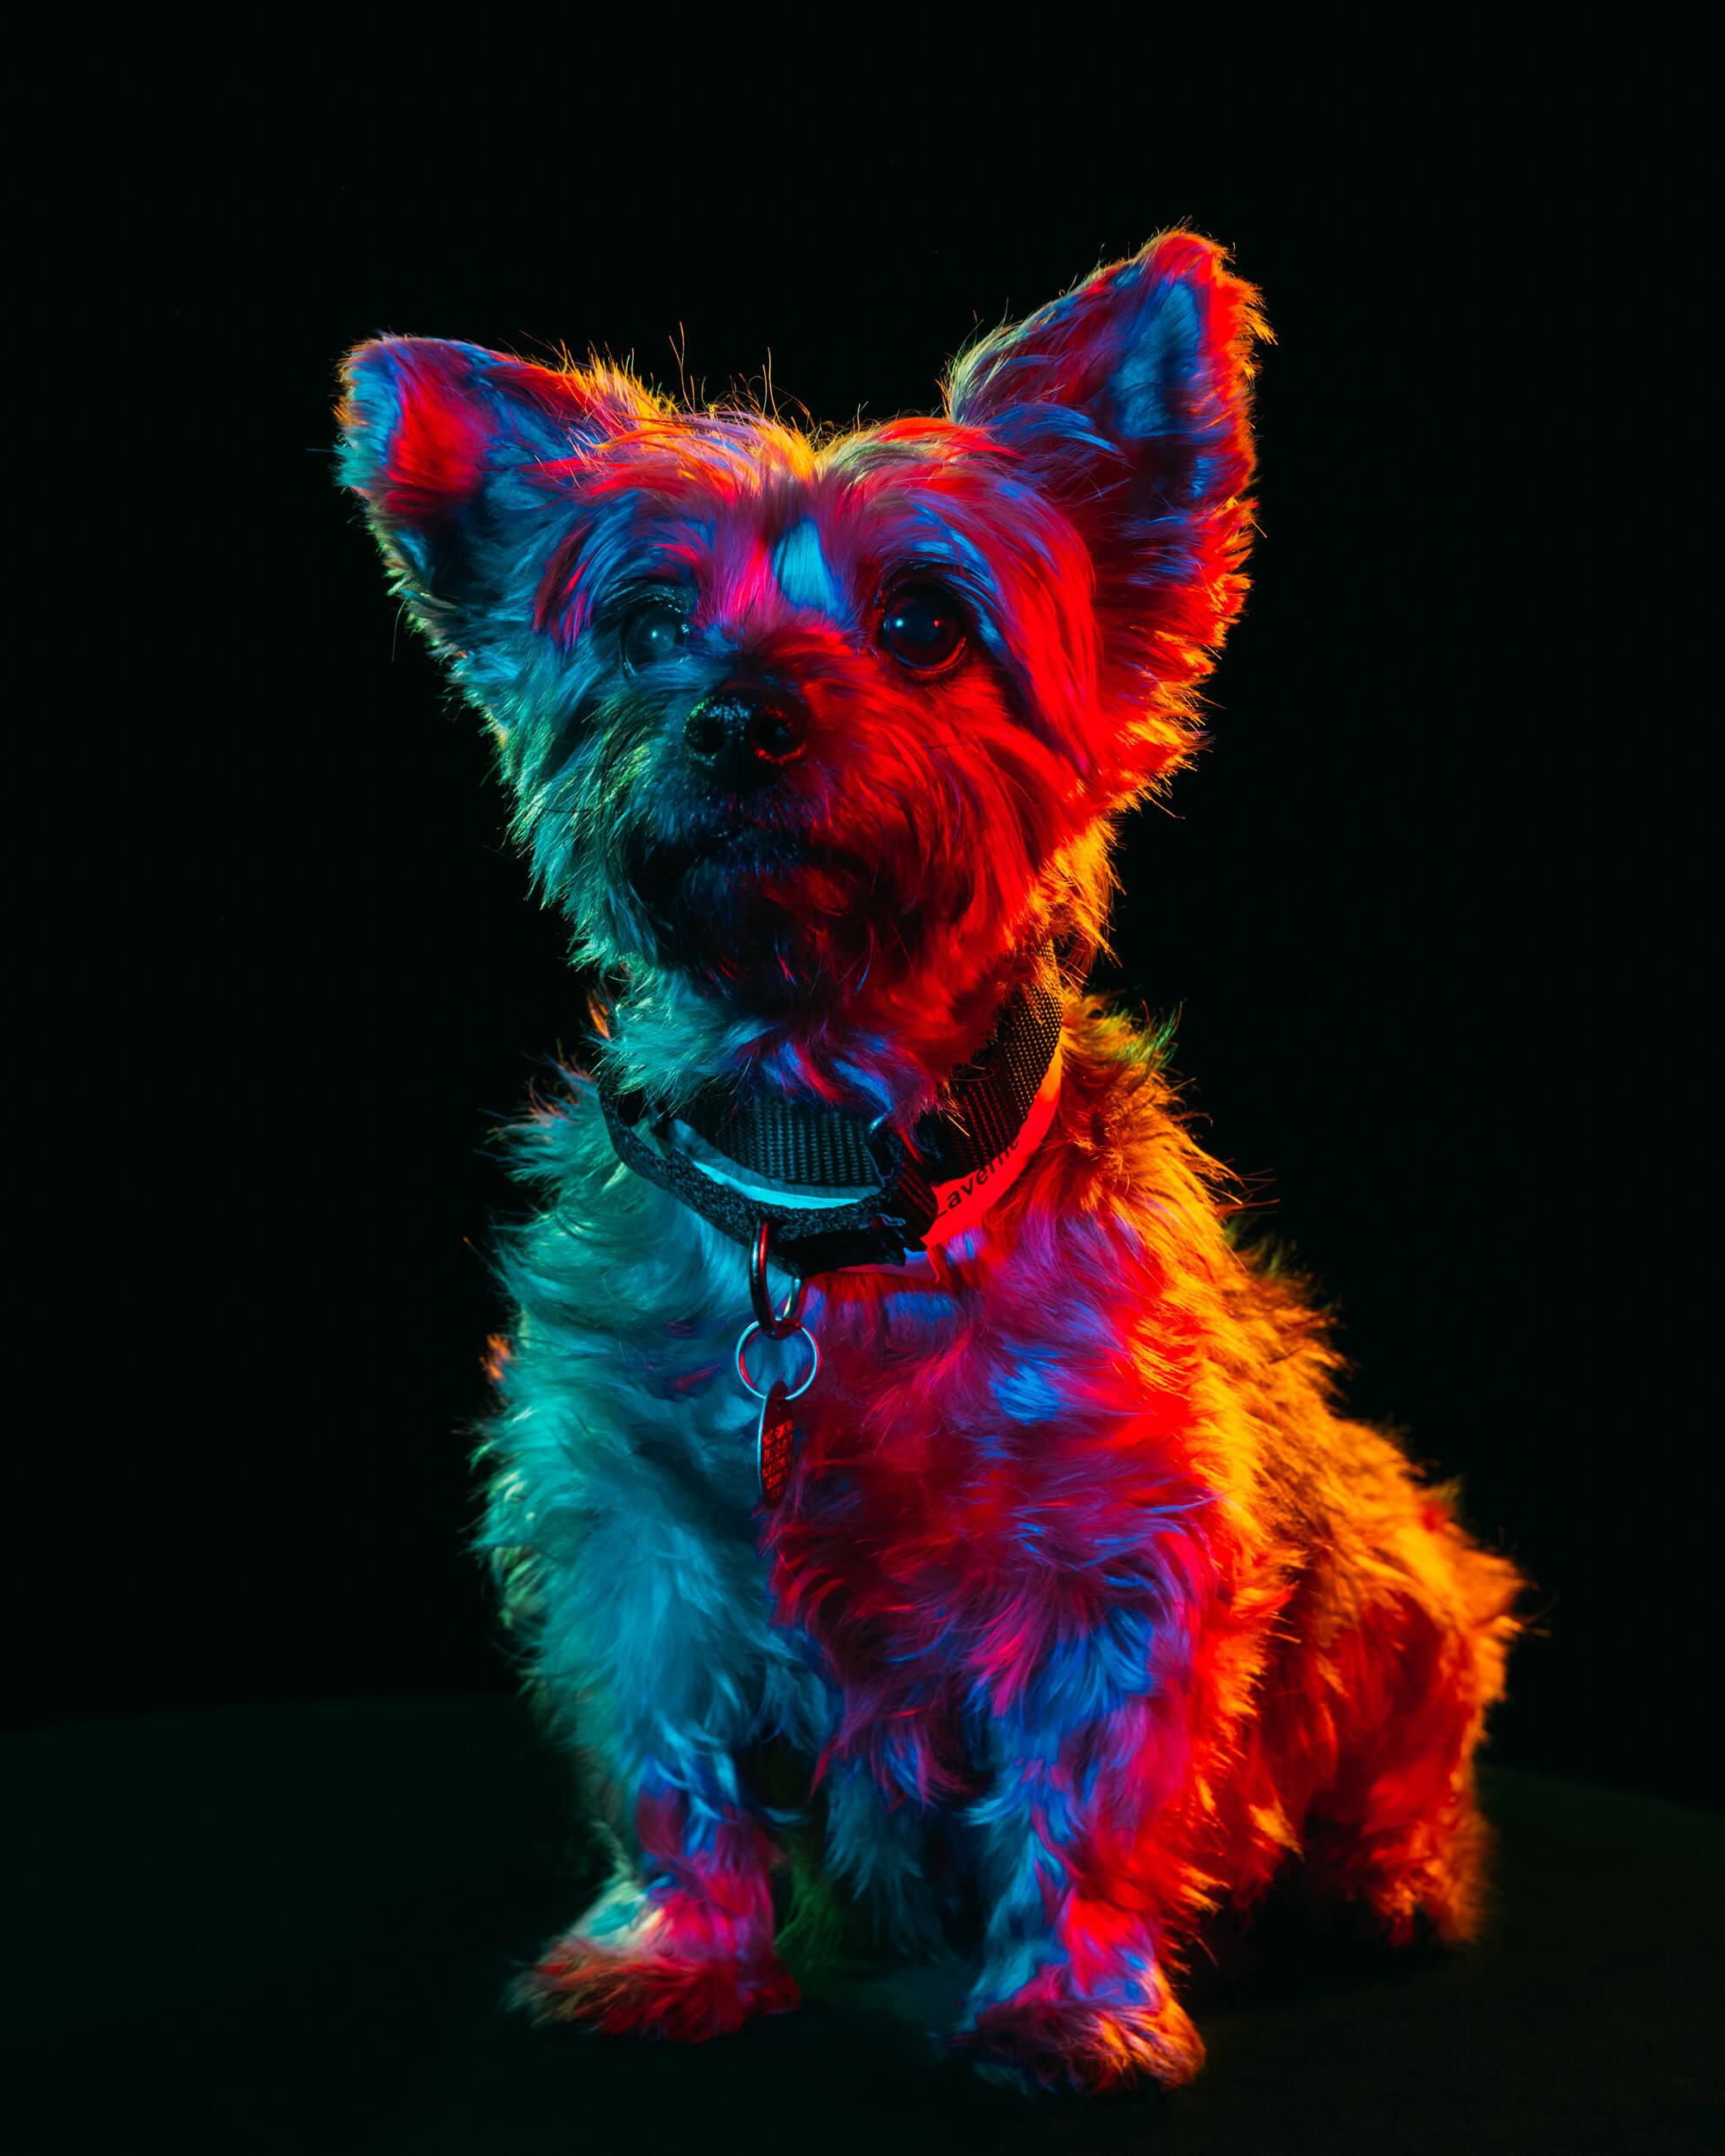 Paul Octavious adoptable dogs portraits 1 (1)